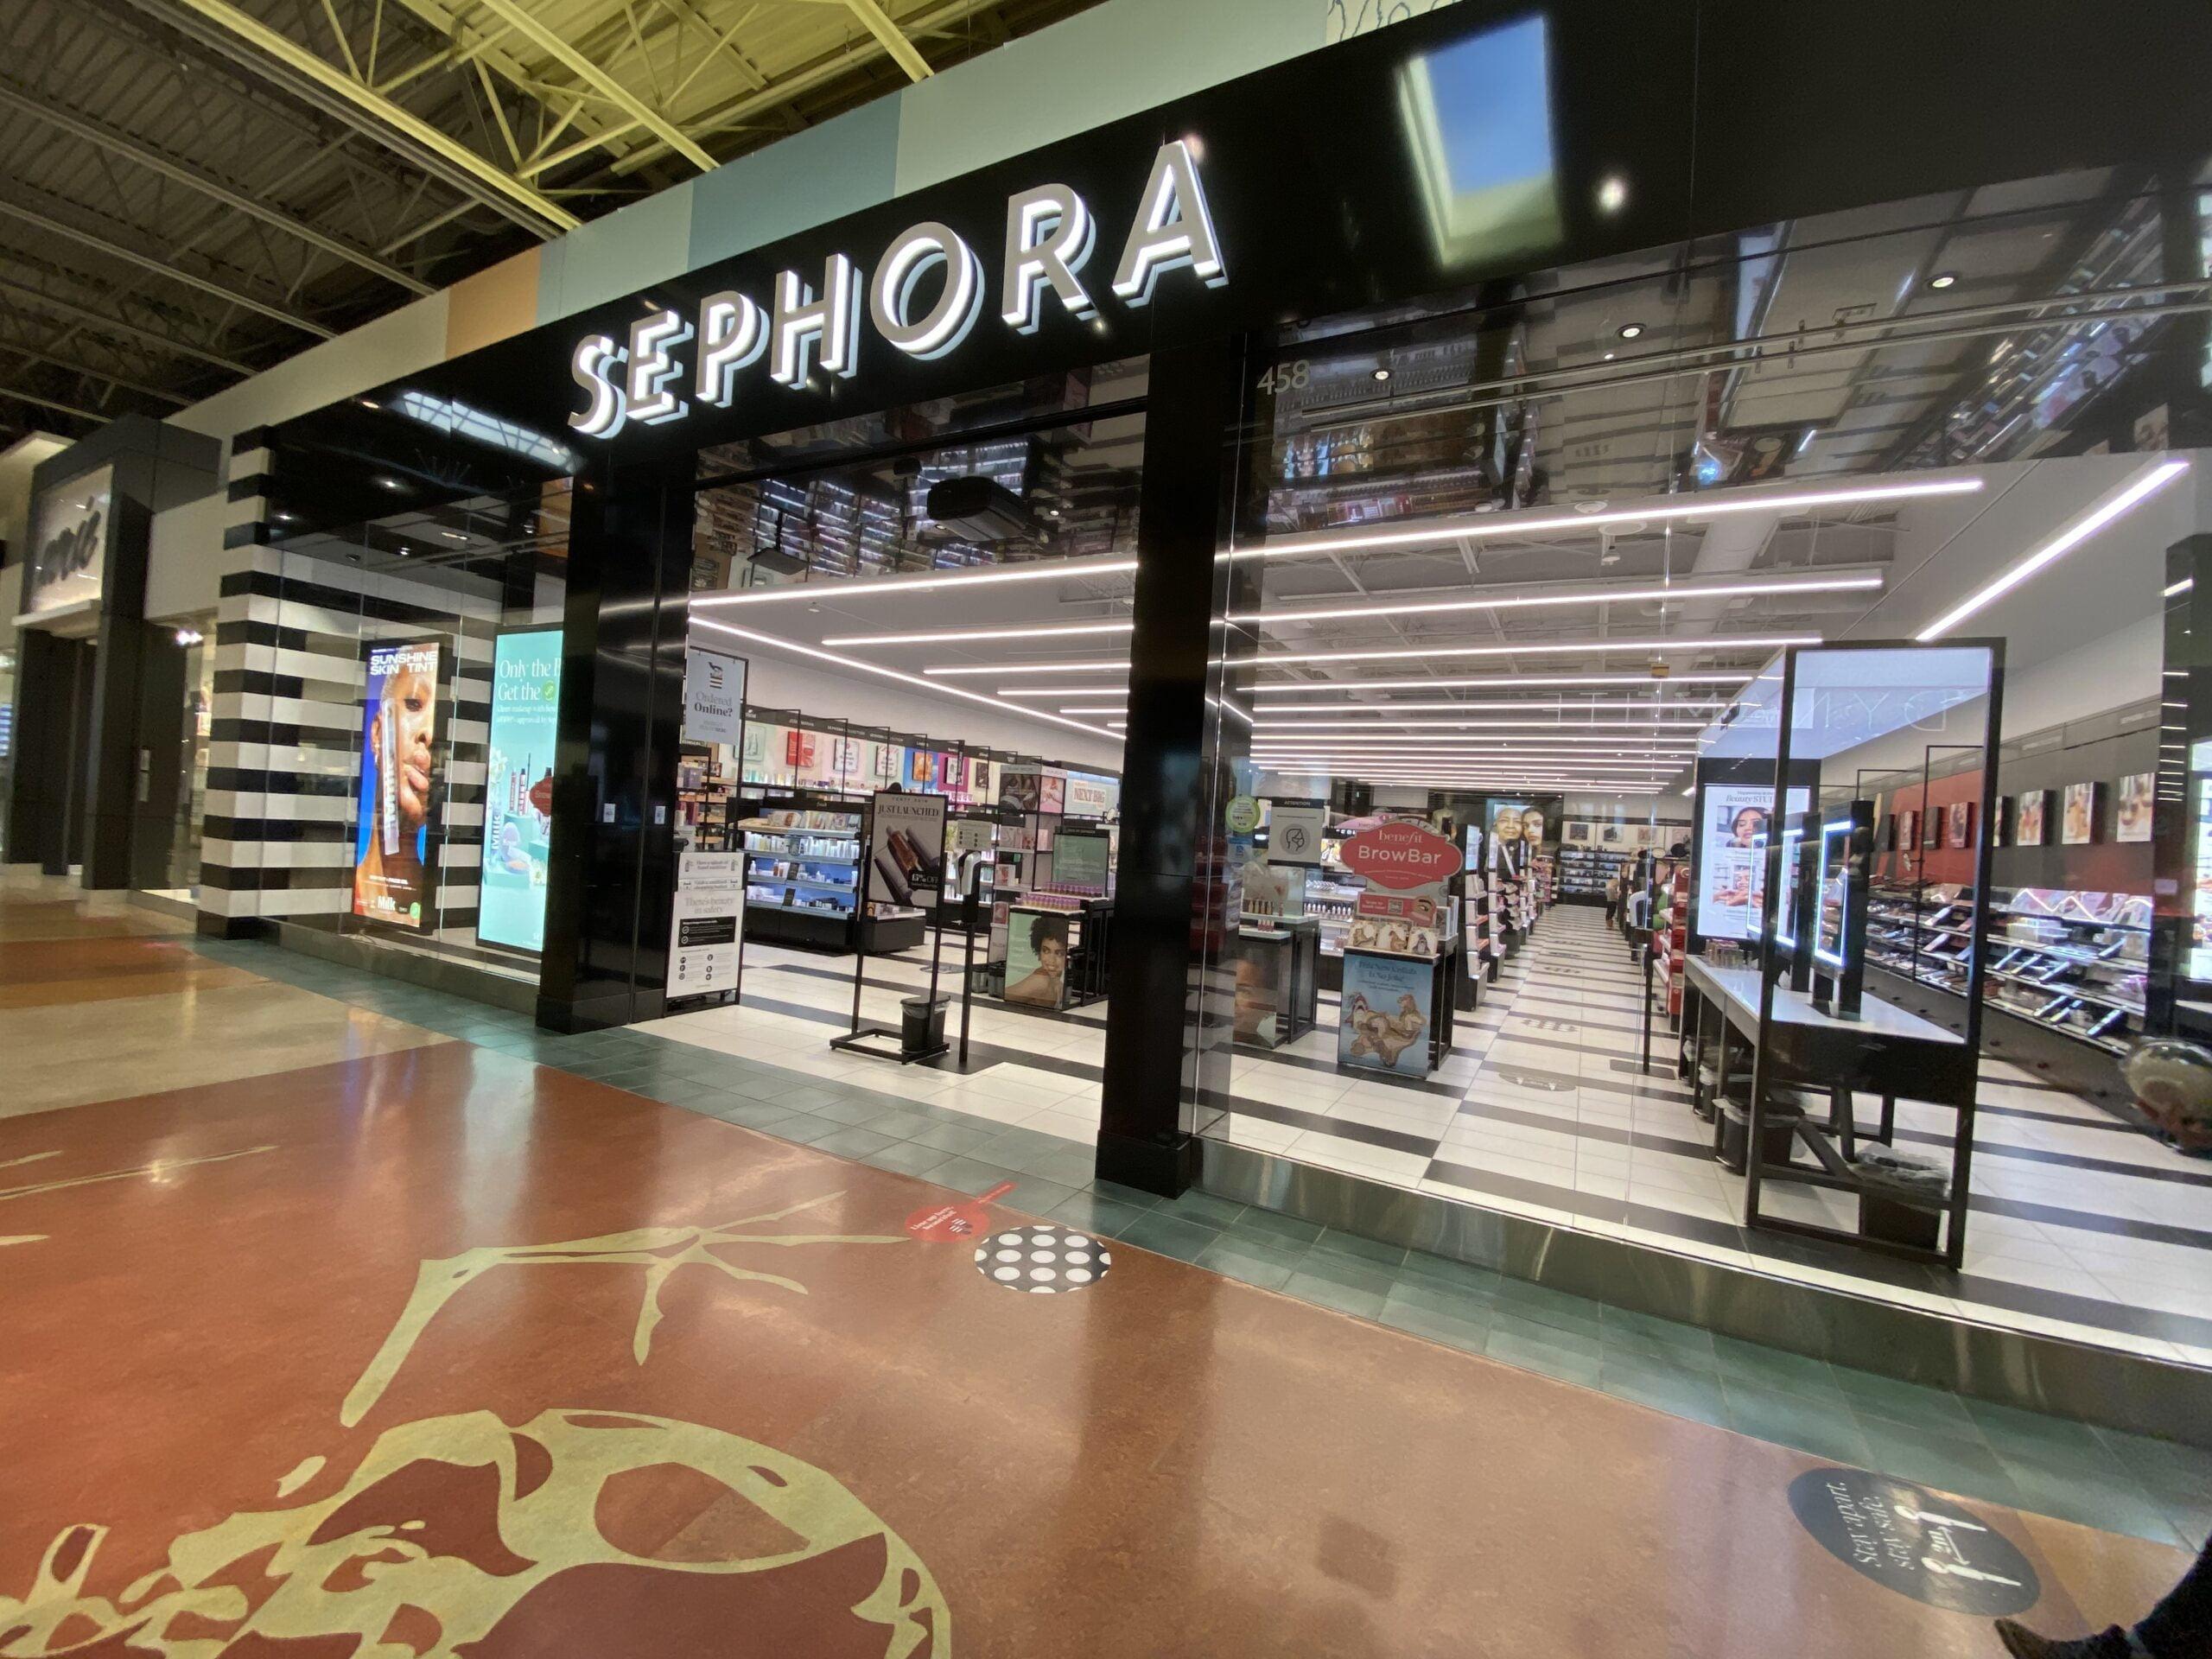 Sephora at CrossIron Mills